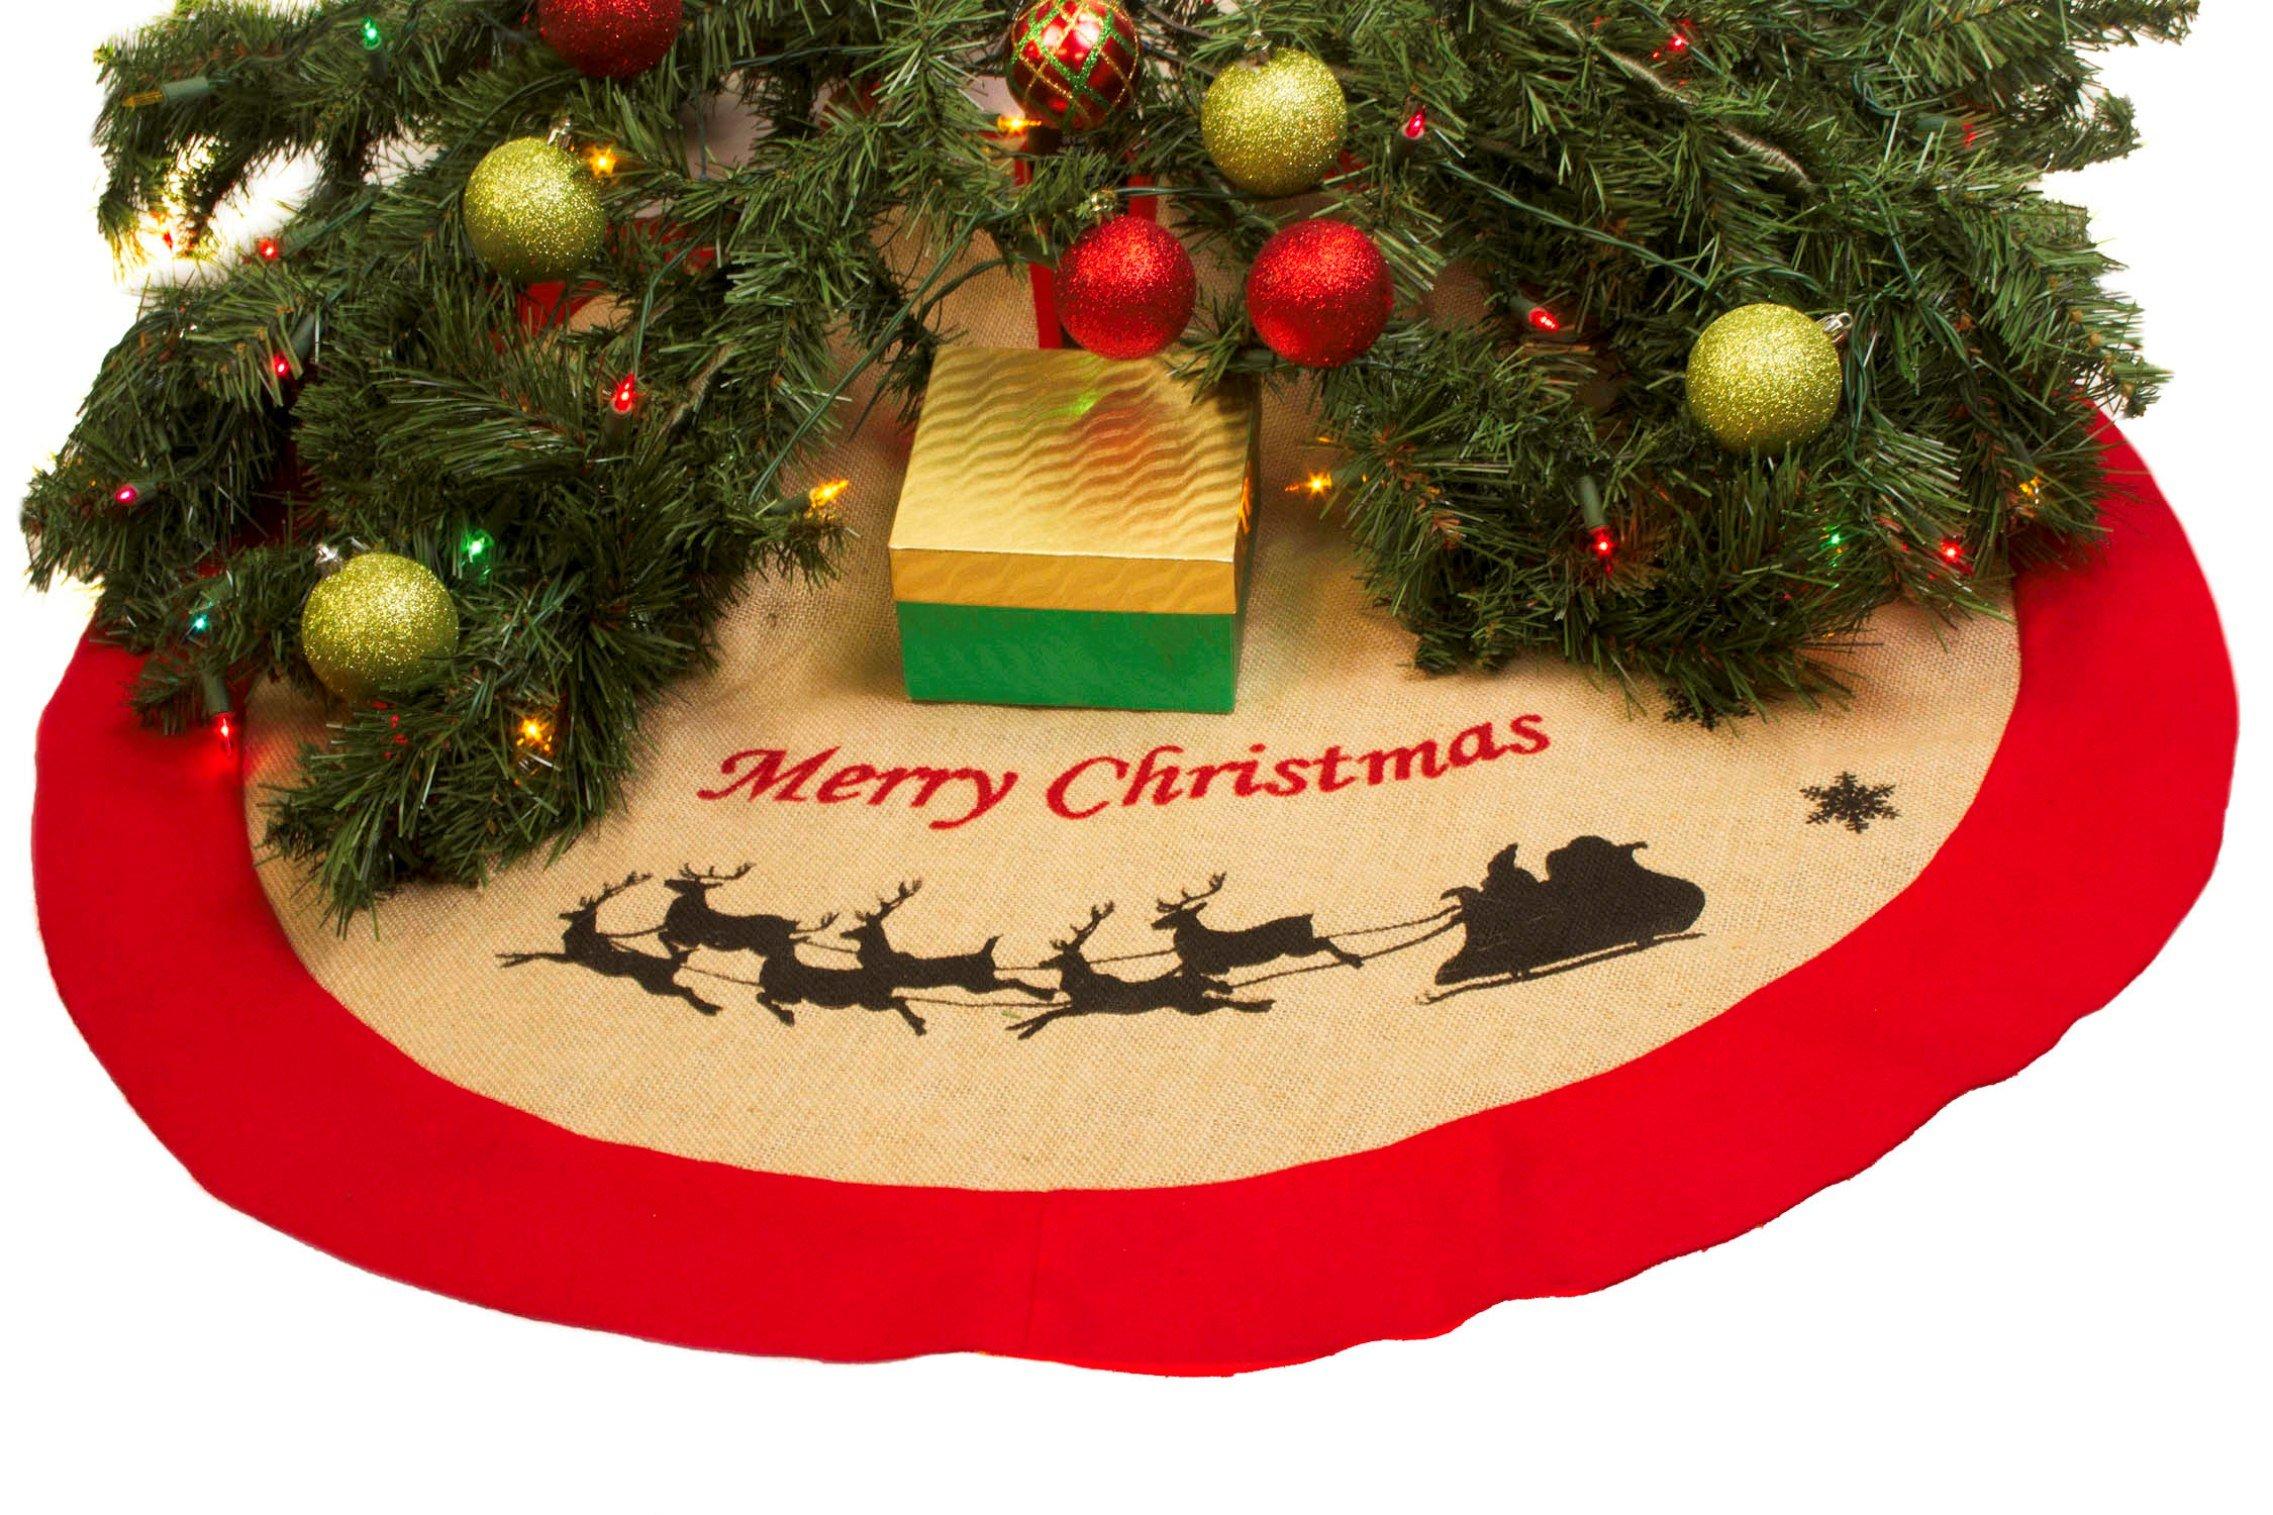 36'' Burlap Christmas Tree Skirt - Xmas Tree Skirt - Red Border Burlap Tree Skirt (Santa & Sleigh)